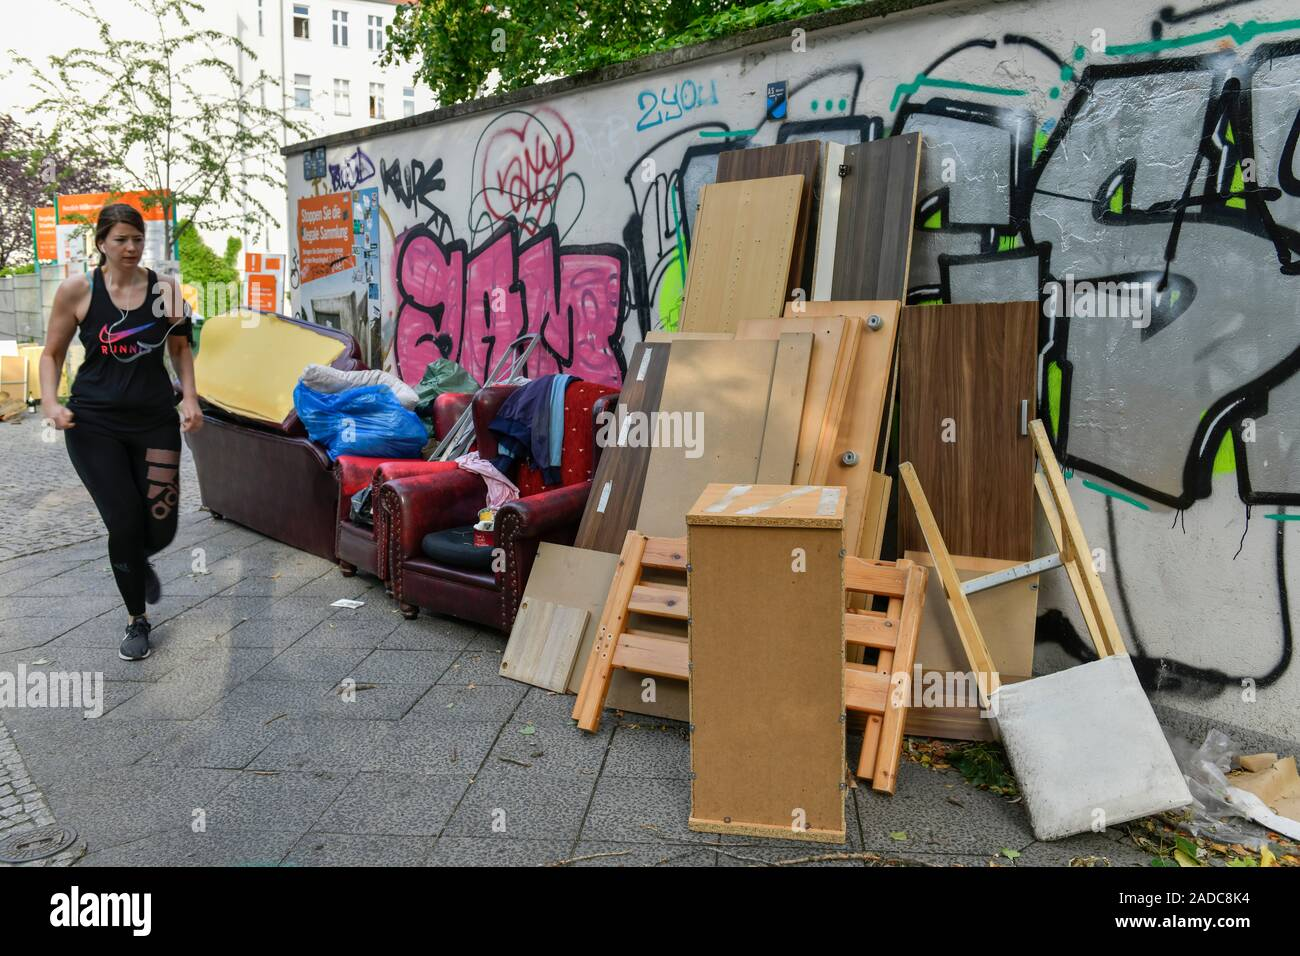 Sperrmüll, Behmstraße, Prenzlauer Berg, Pankow, Berlin, Deutschland Stock Photo